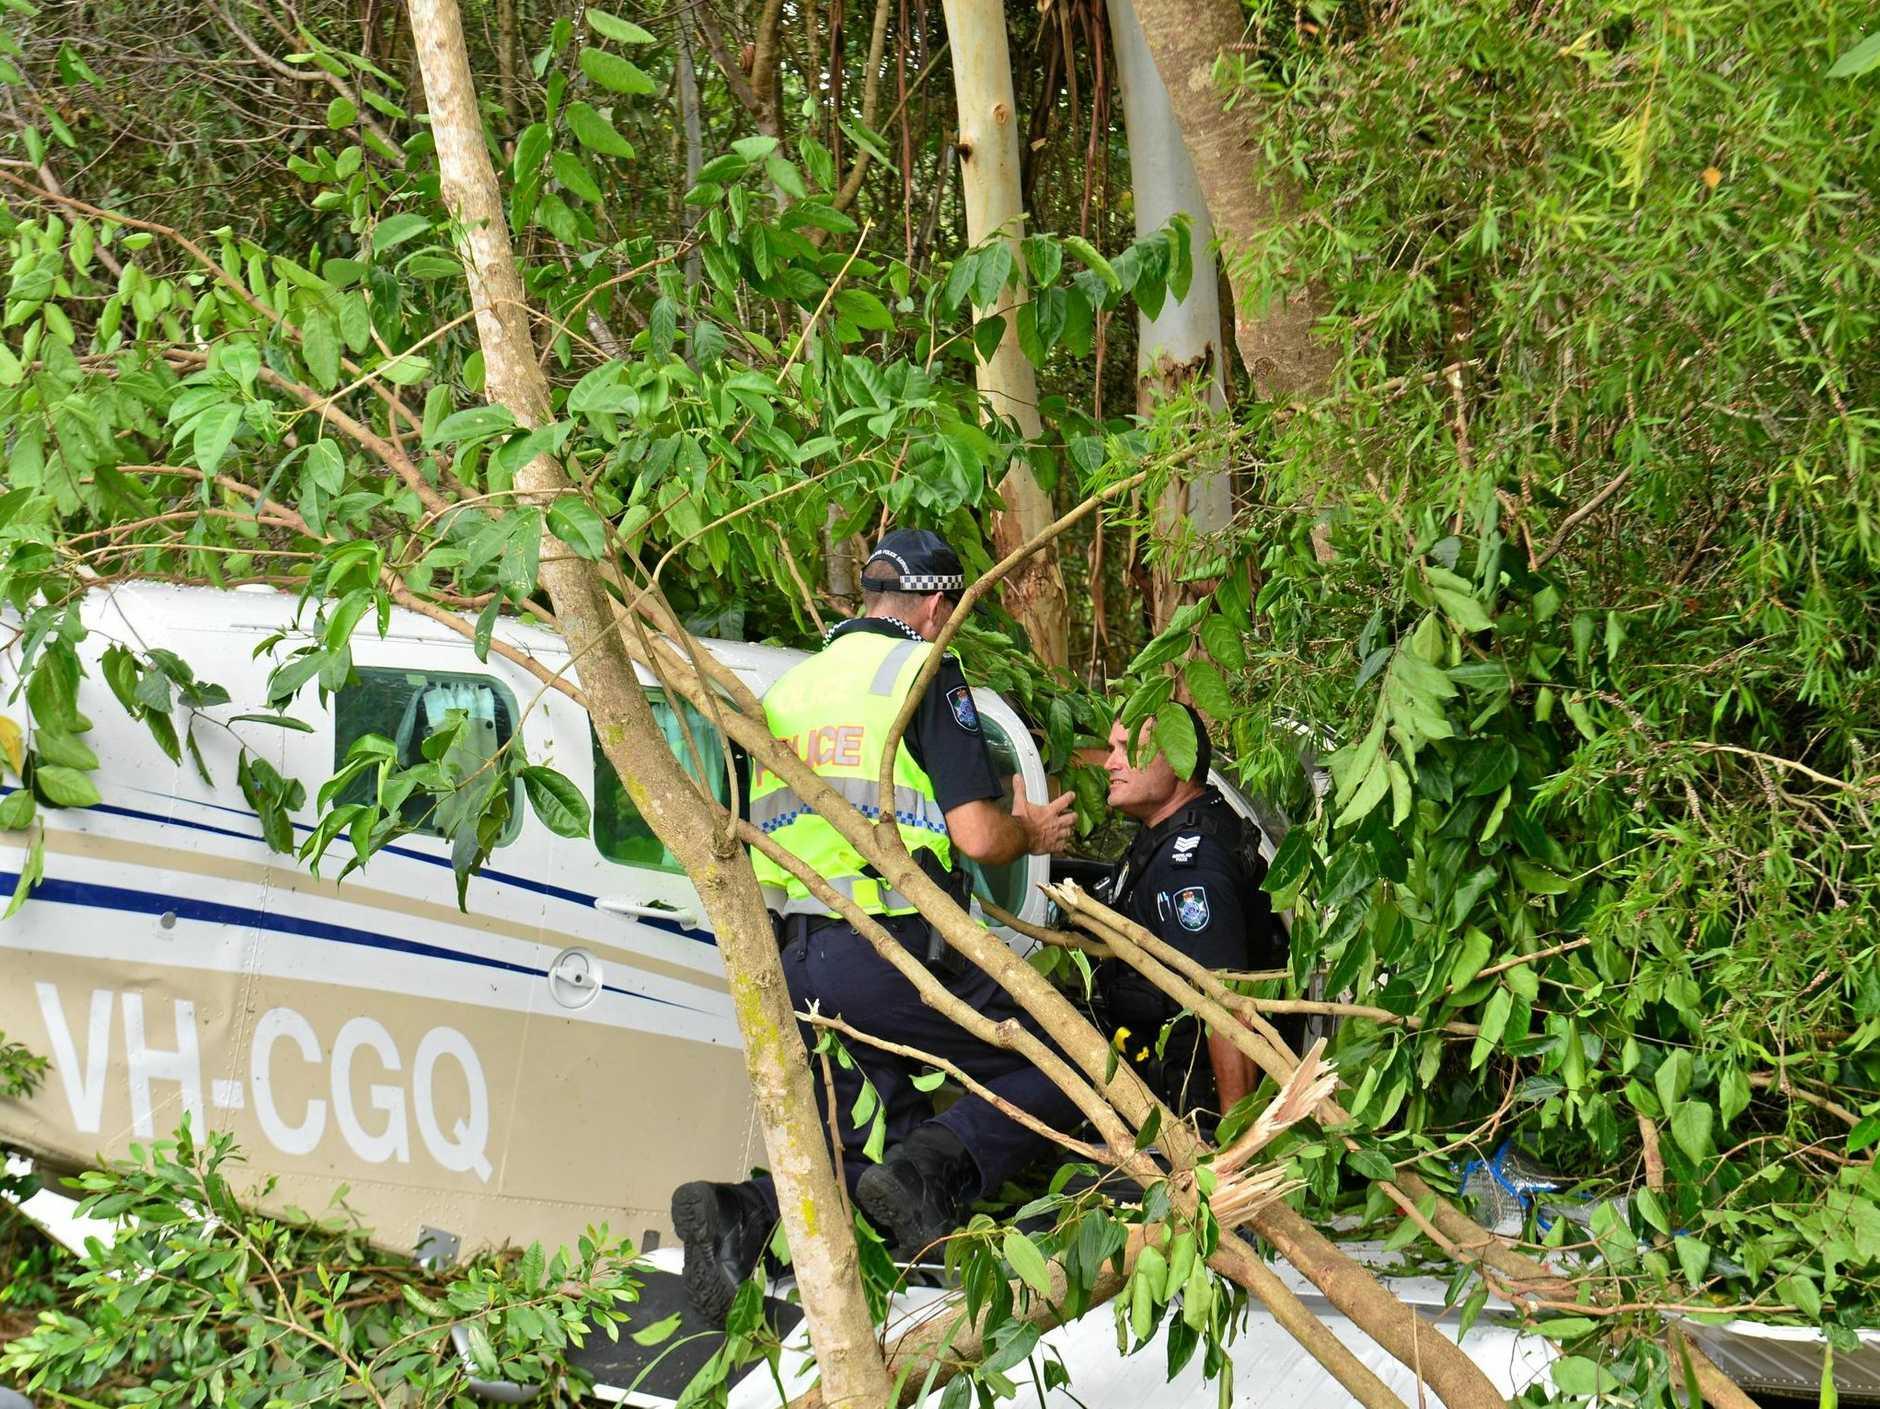 A plane crashed in the suburb of Palmwoods, Sunshine Coast.